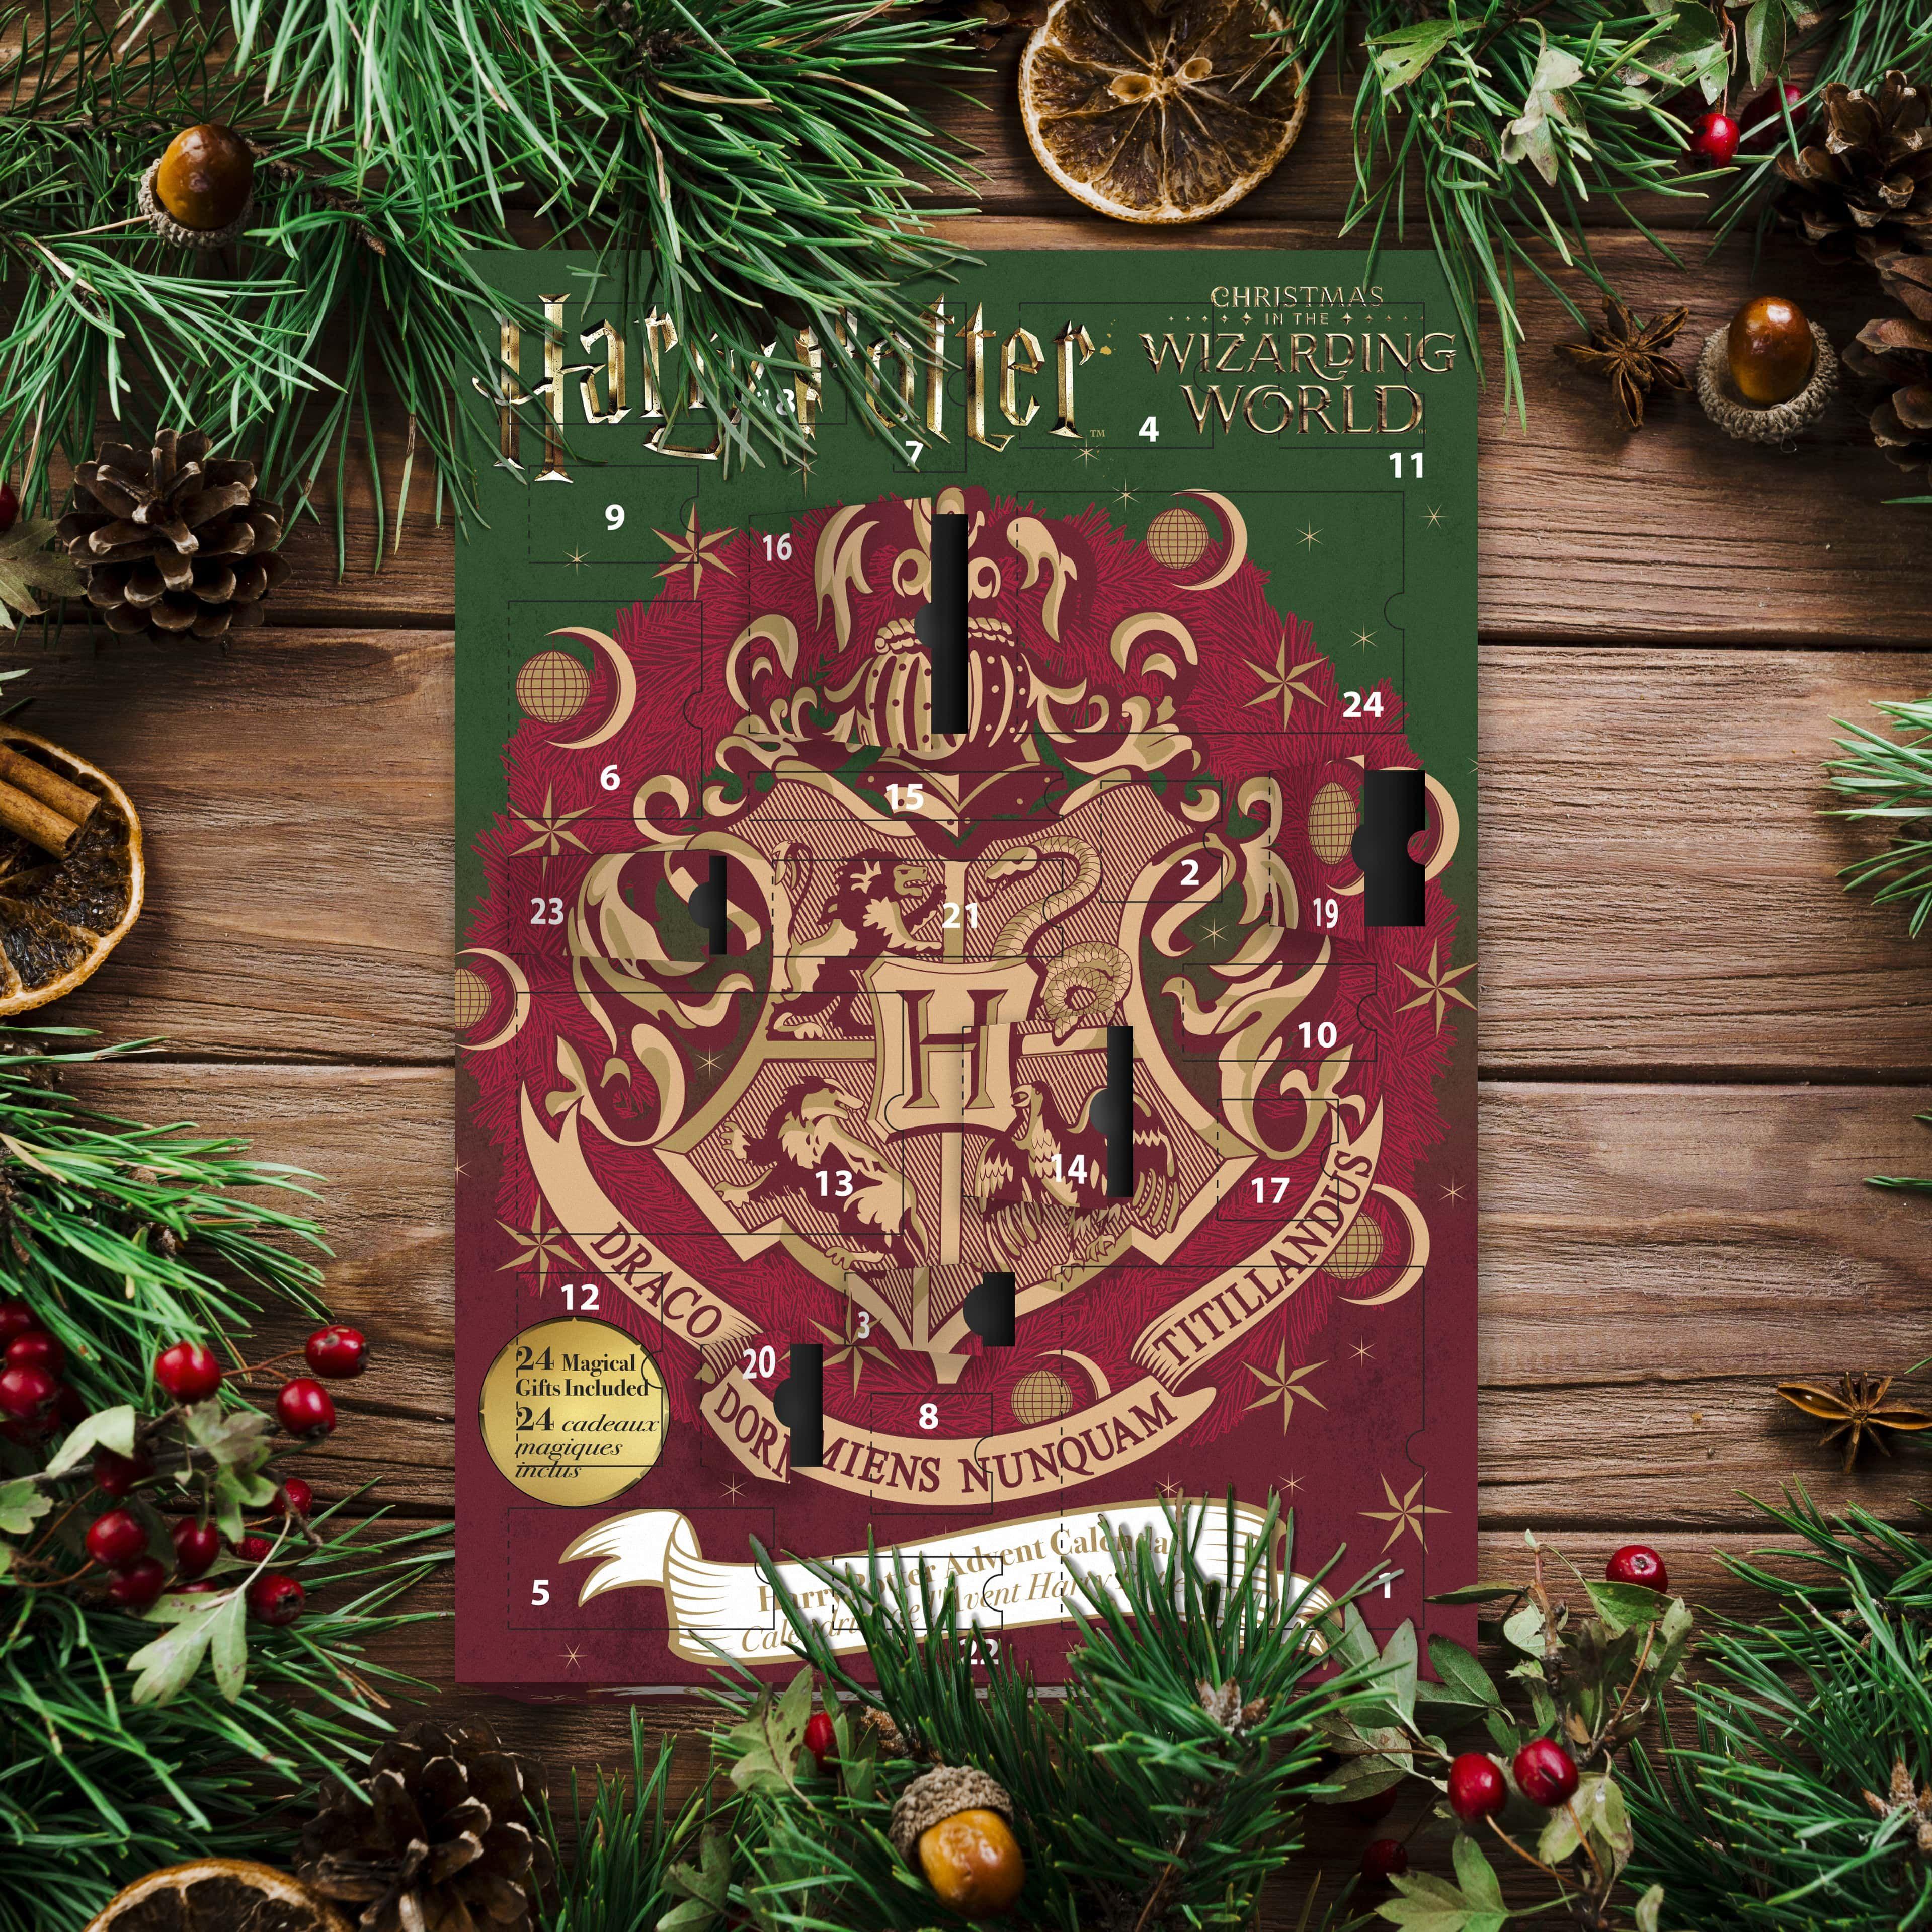 Harry Potter Advent Calendar 2019 Harry Potter Advent Calendar Harry Potter Christmas Christmas Colors